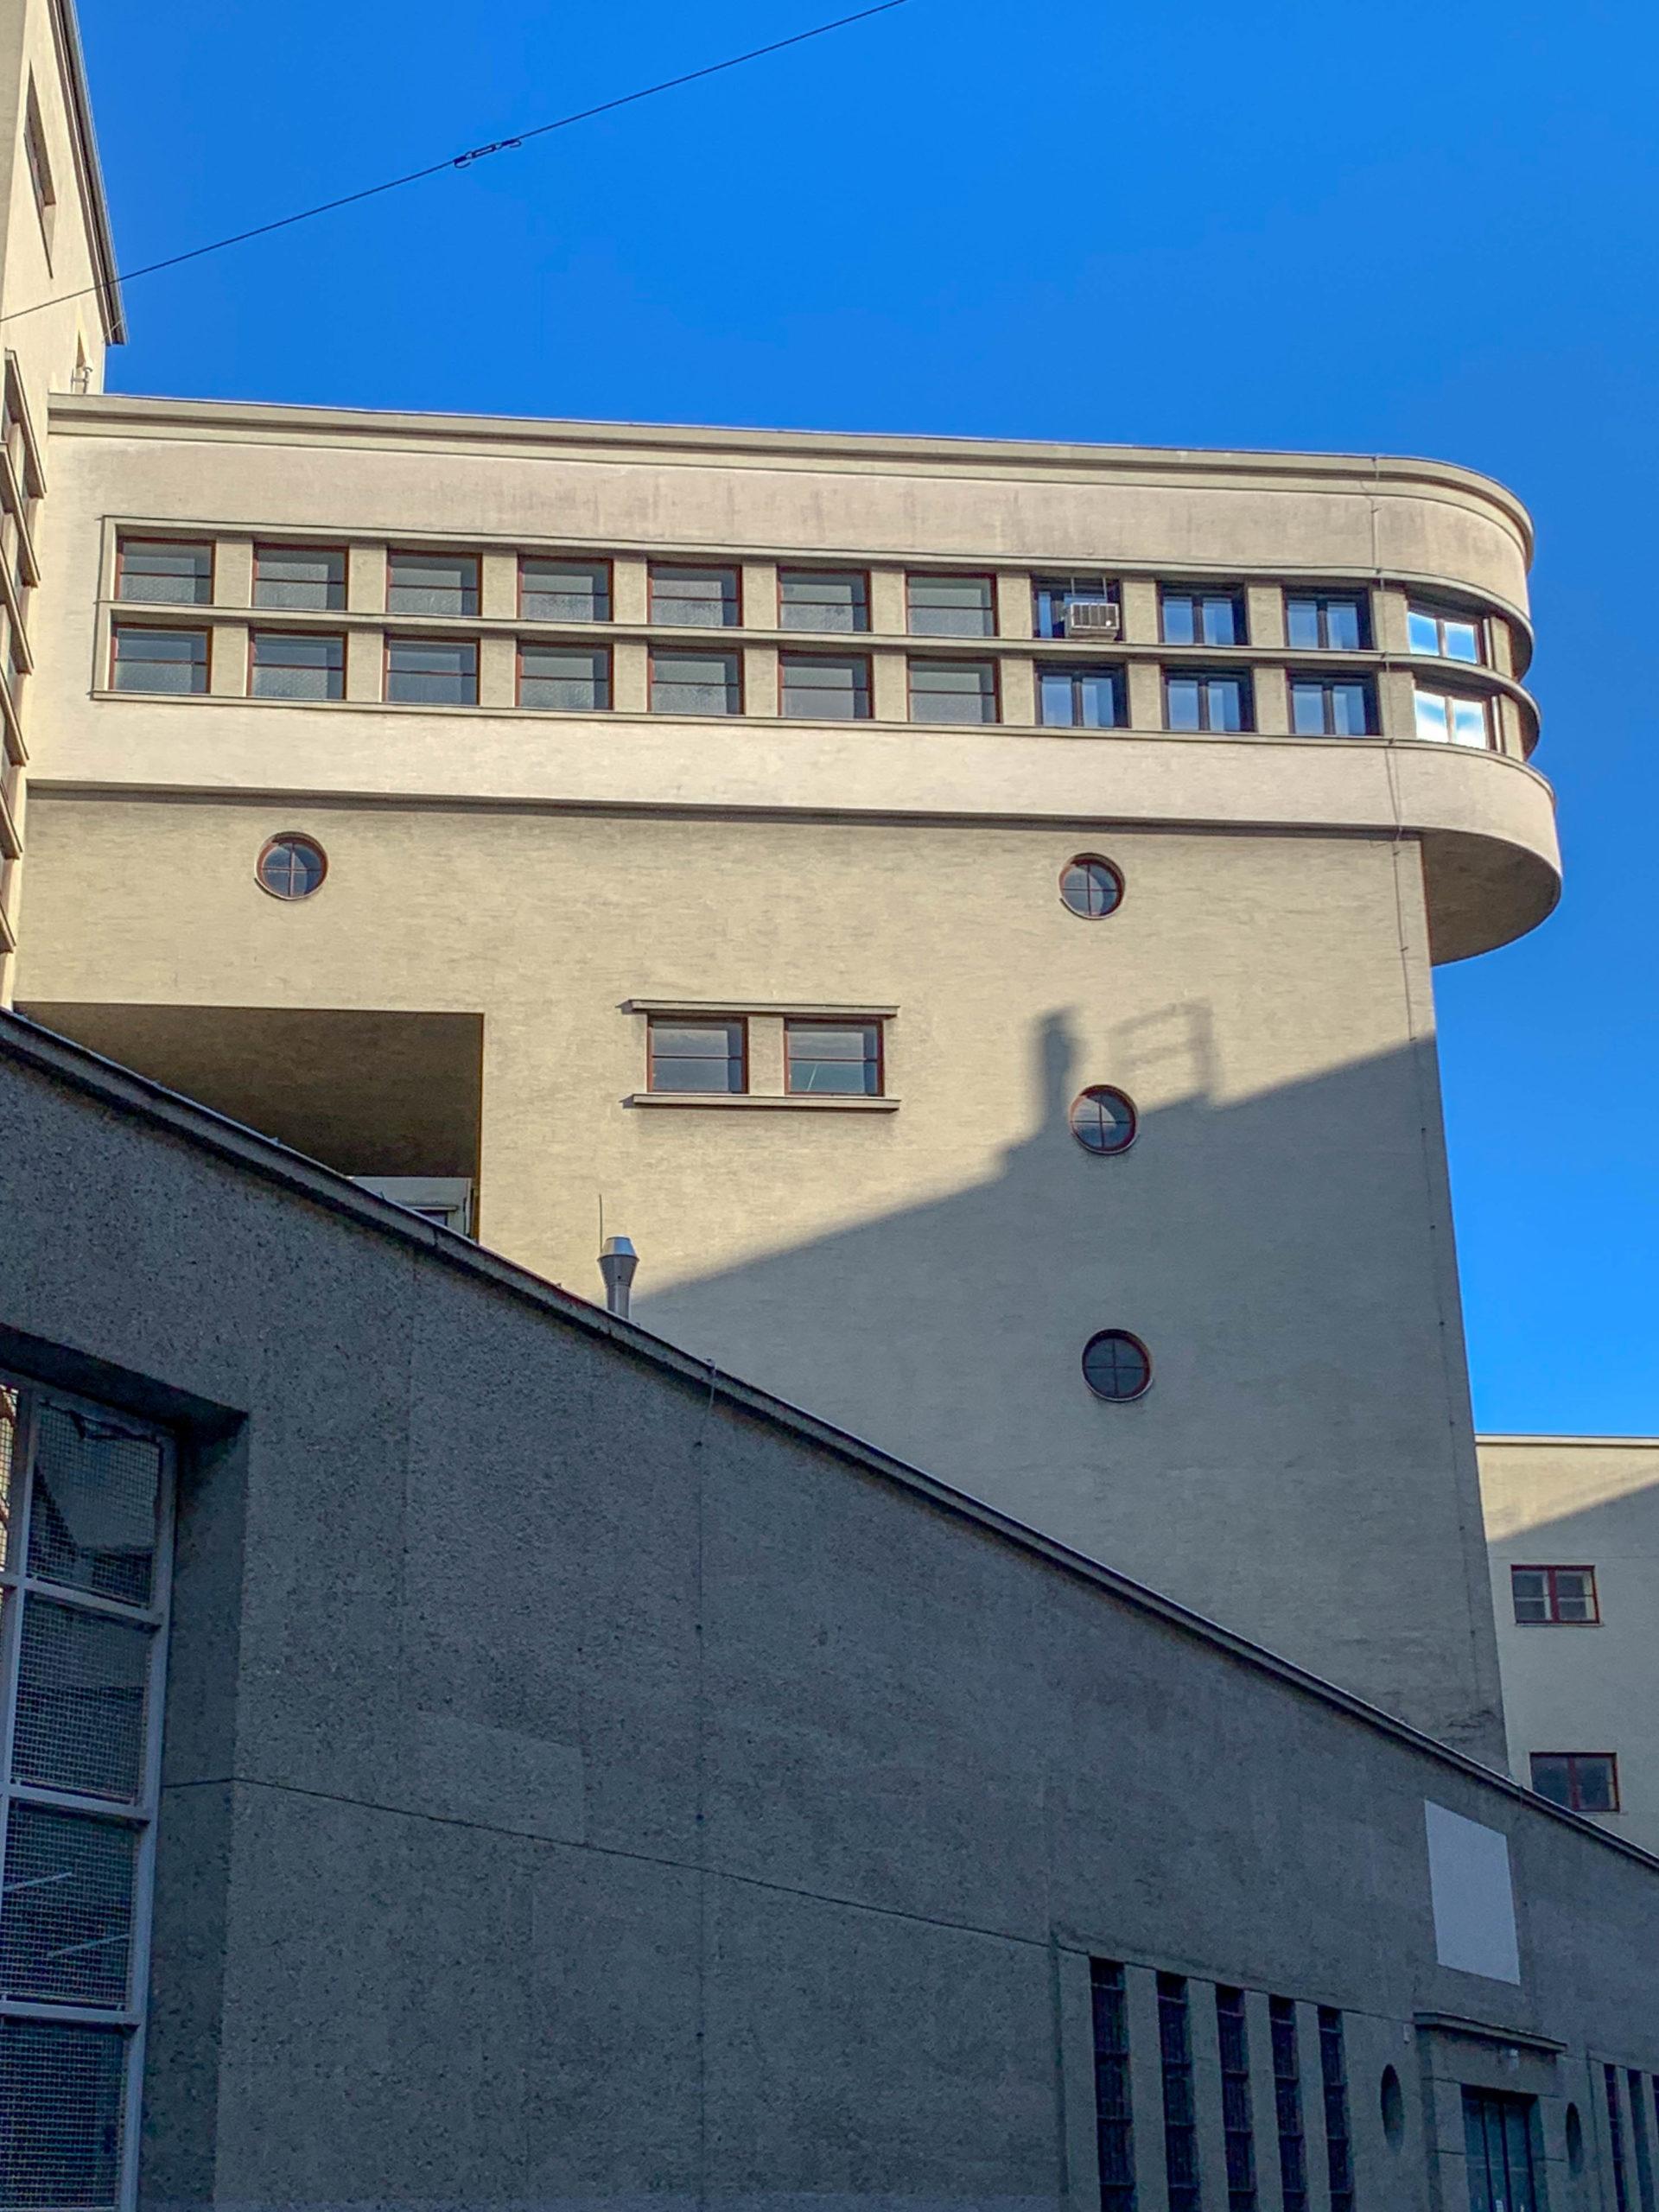 Umpannwerk Favoriten, 1929-1931. Architektem: Eugen Kastner, Fritz Waage